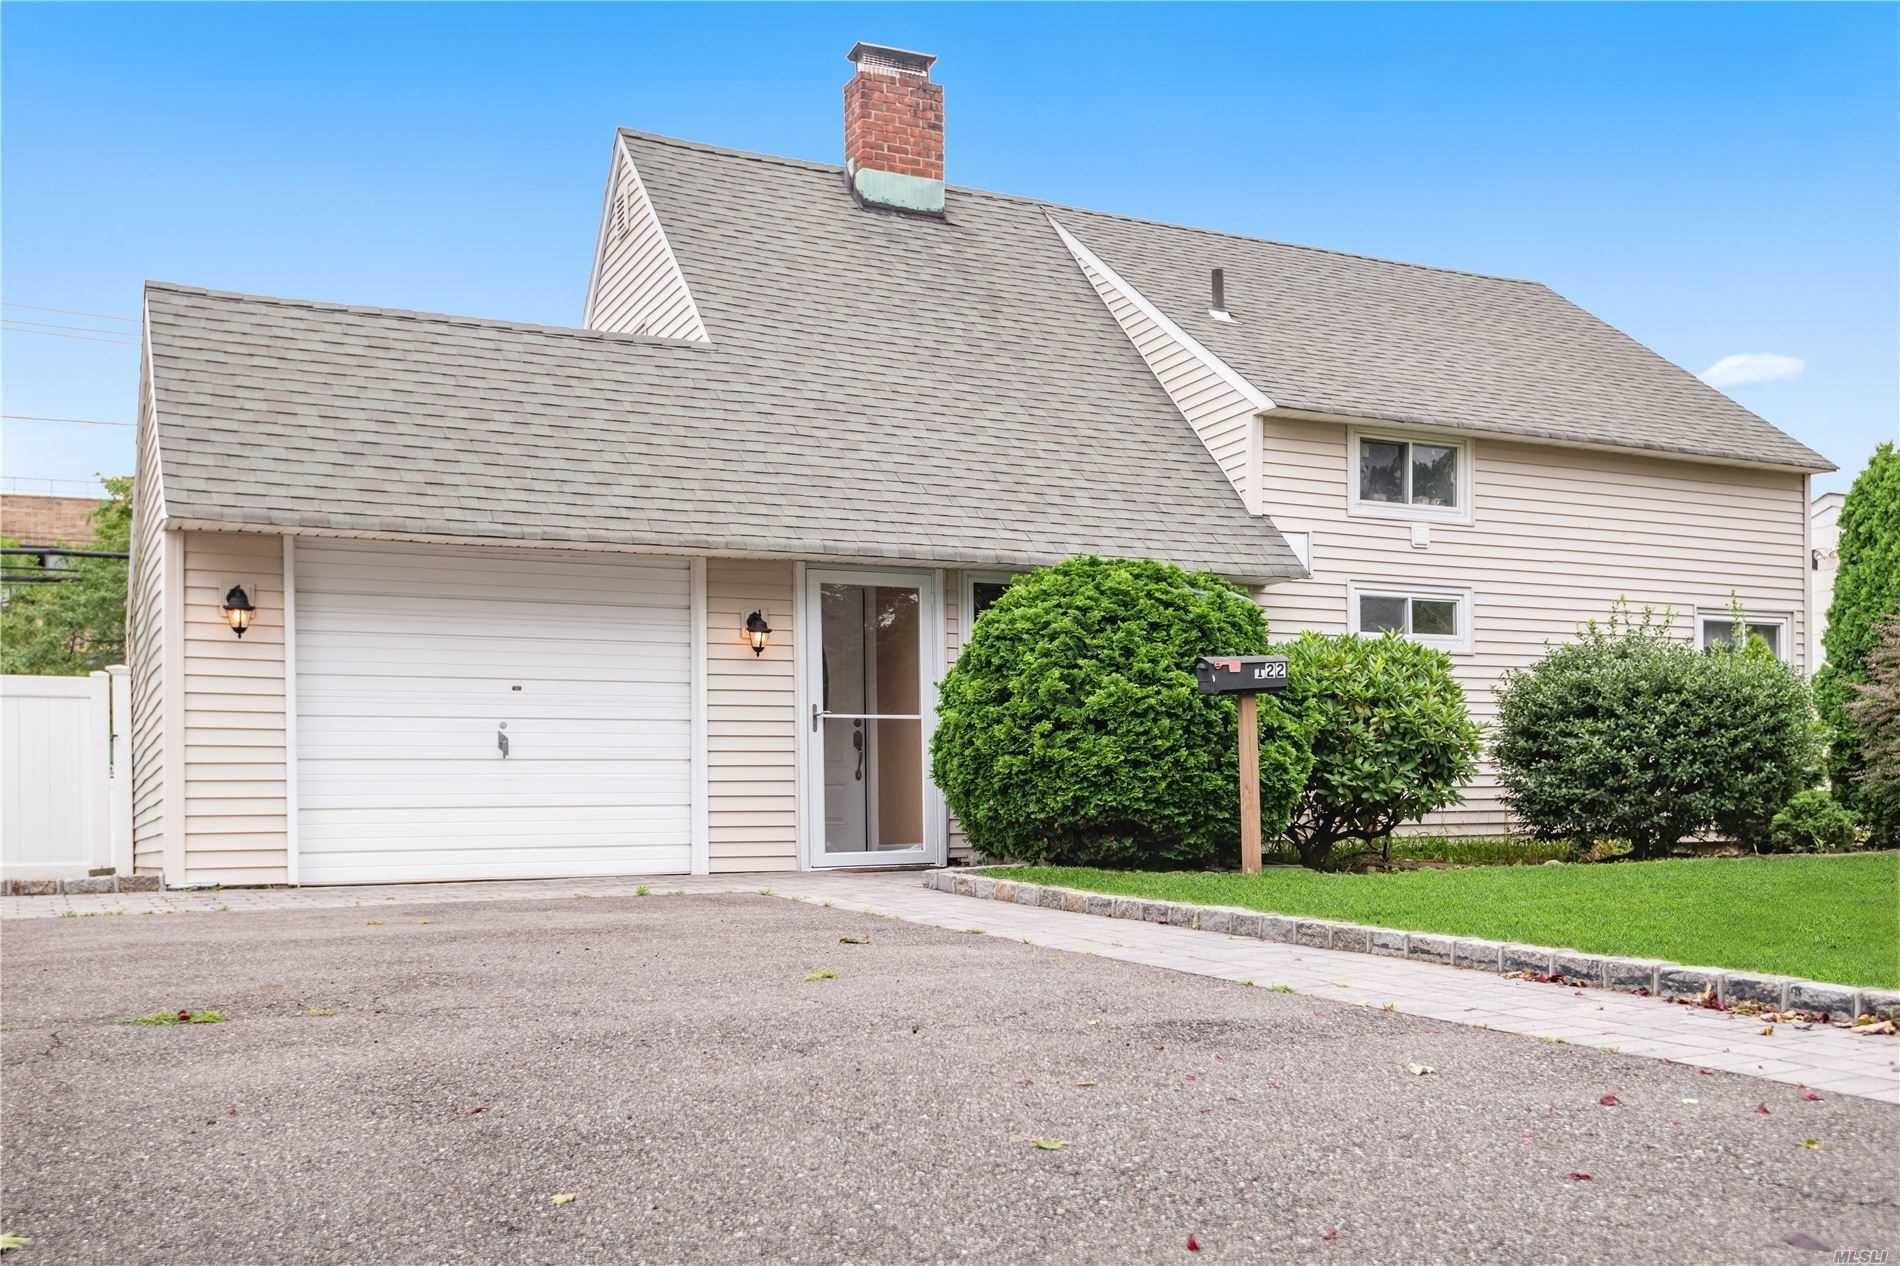 122 Acre Lane, Hicksville, NY 11801 - MLS#: 3239173